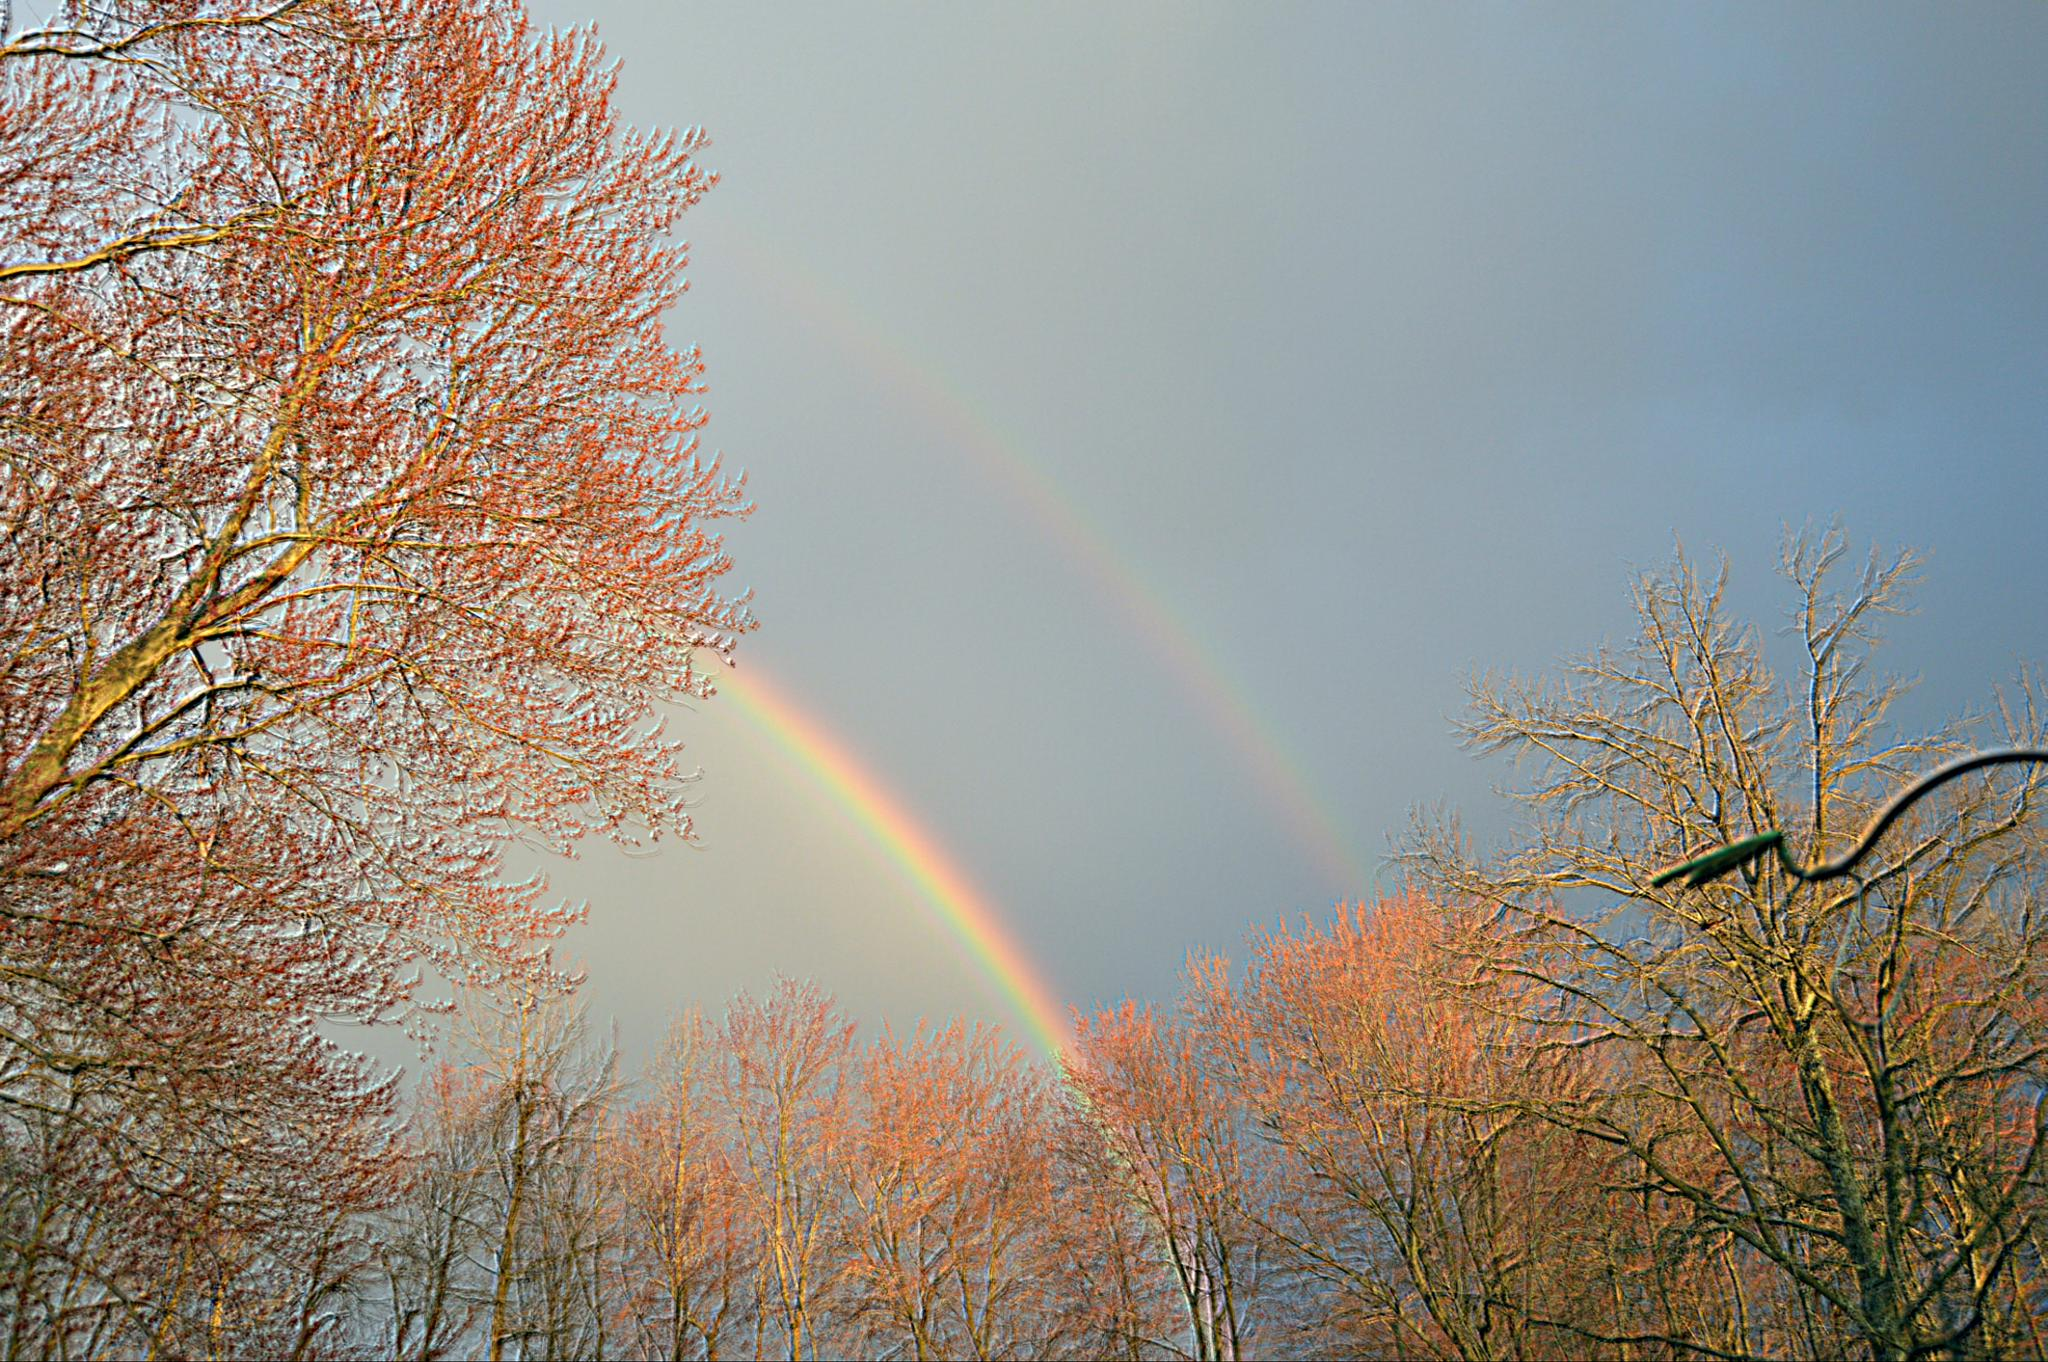 Double Rainbow by donna.reagan2